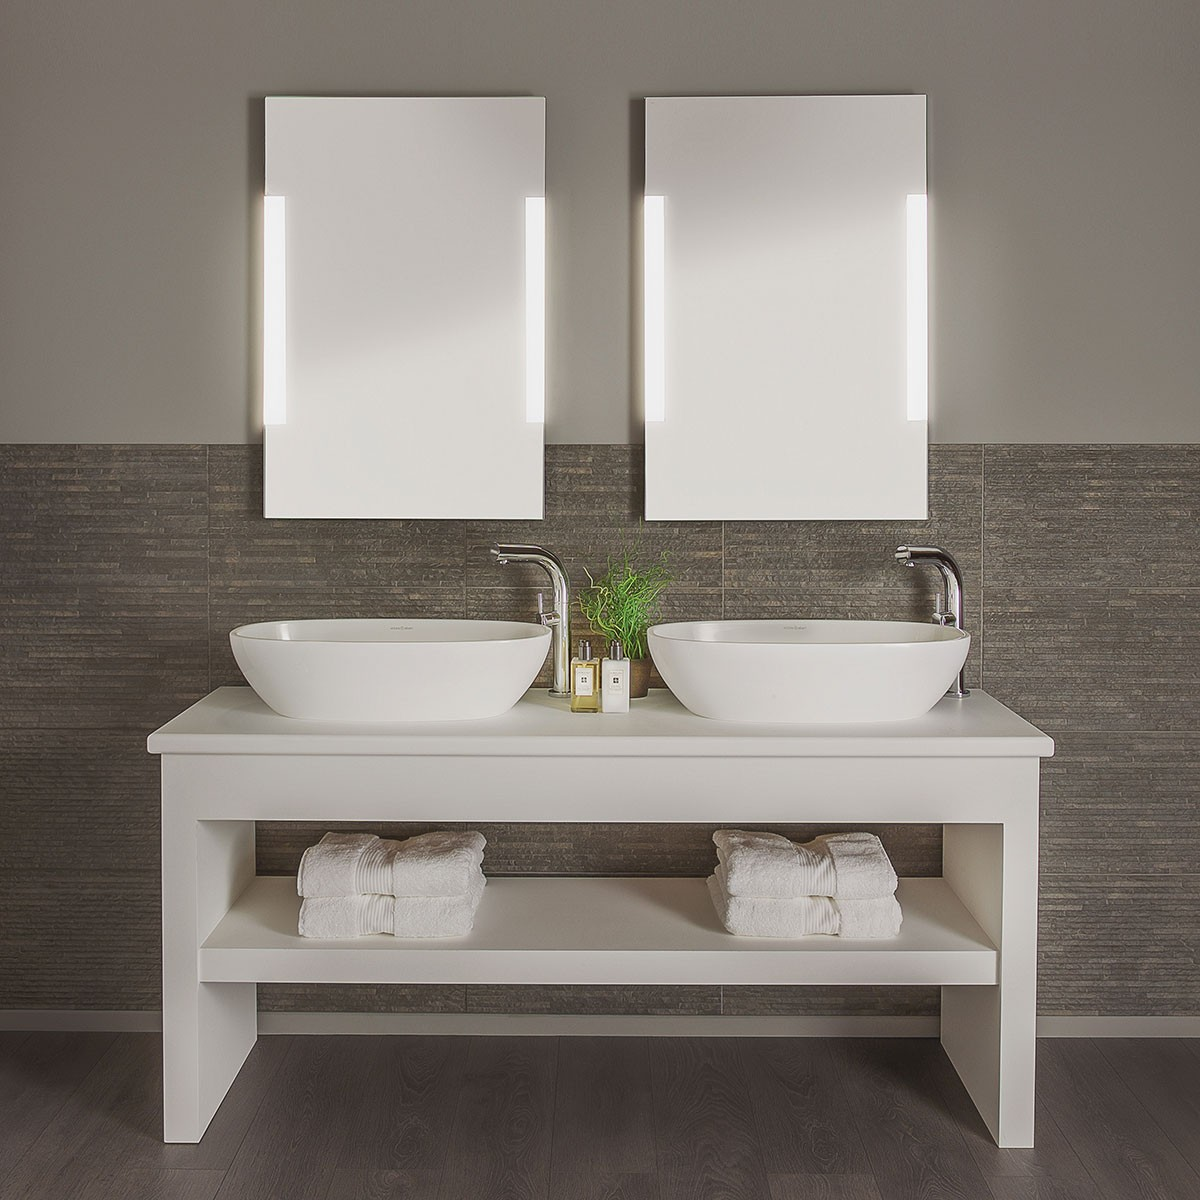 Bathroom Mirror Lights Uk: Astro Imola 900 Polished Chrome Bathroom Mirror Light At